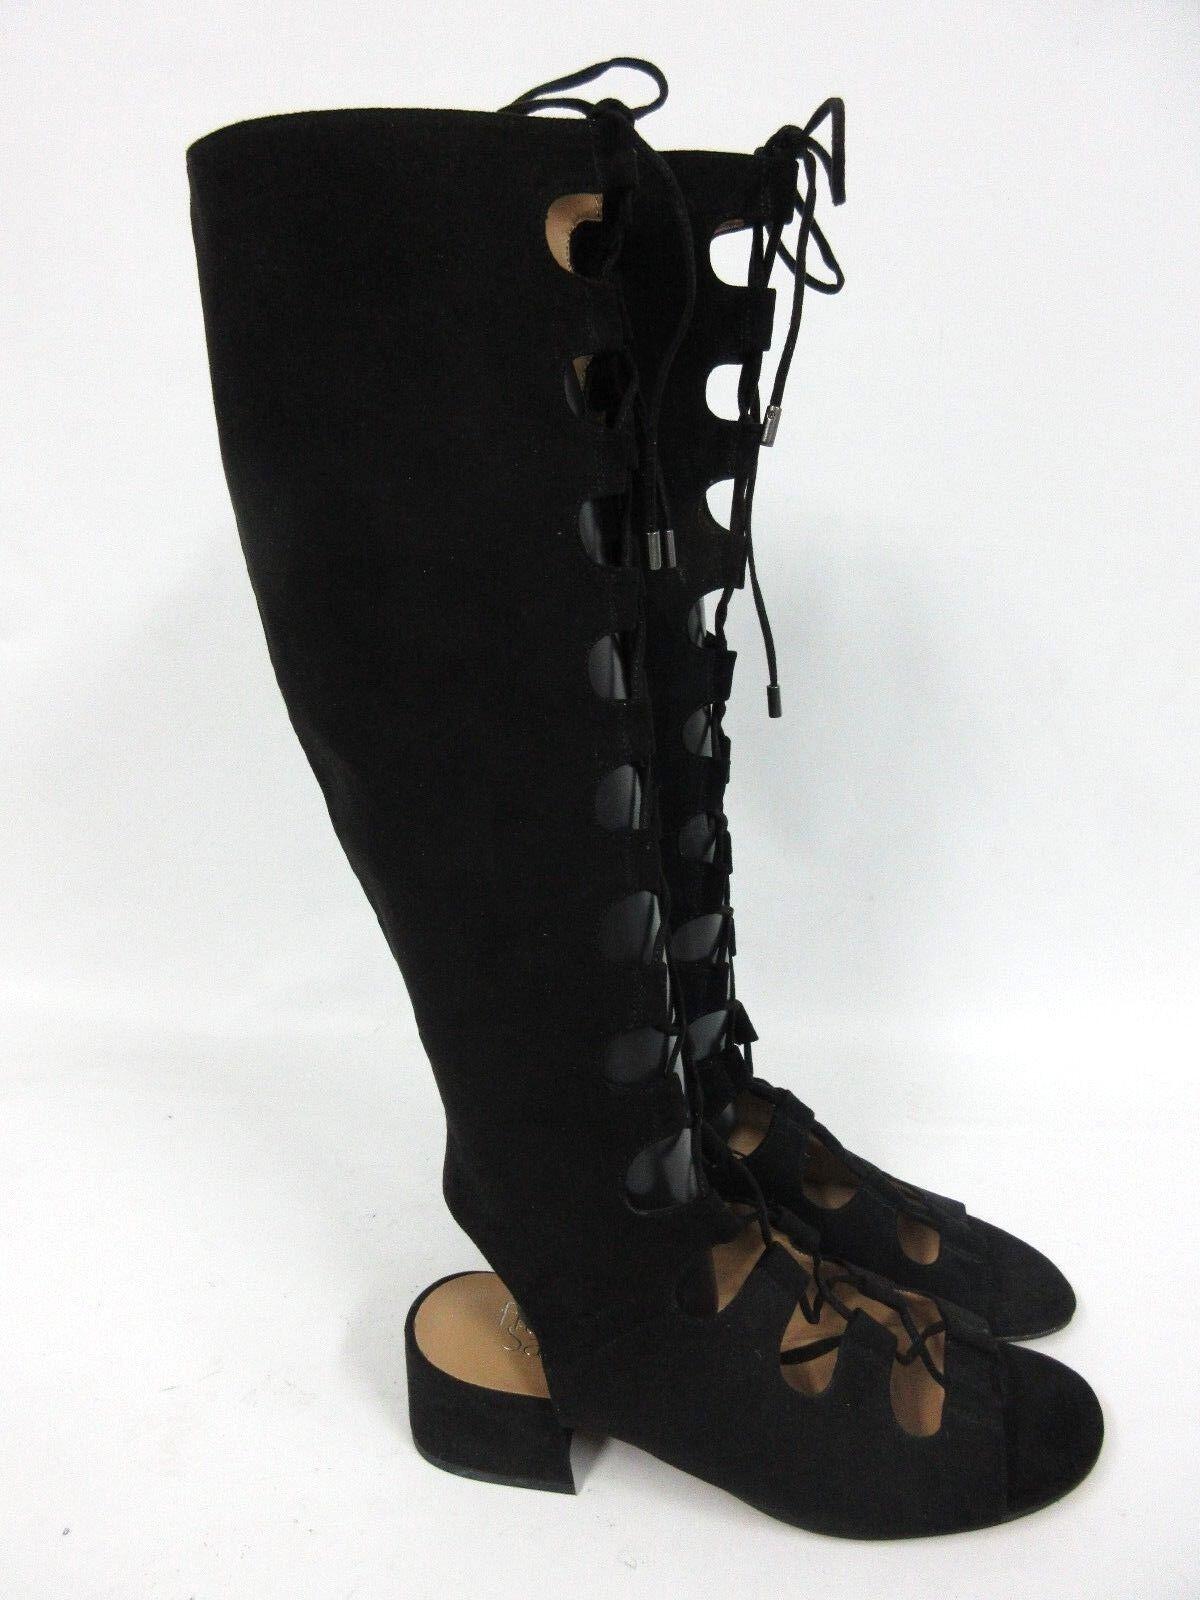 NEU Franco Sarto Damen Trystin hoch Gladiator Sandale schwarz Größe: 8M